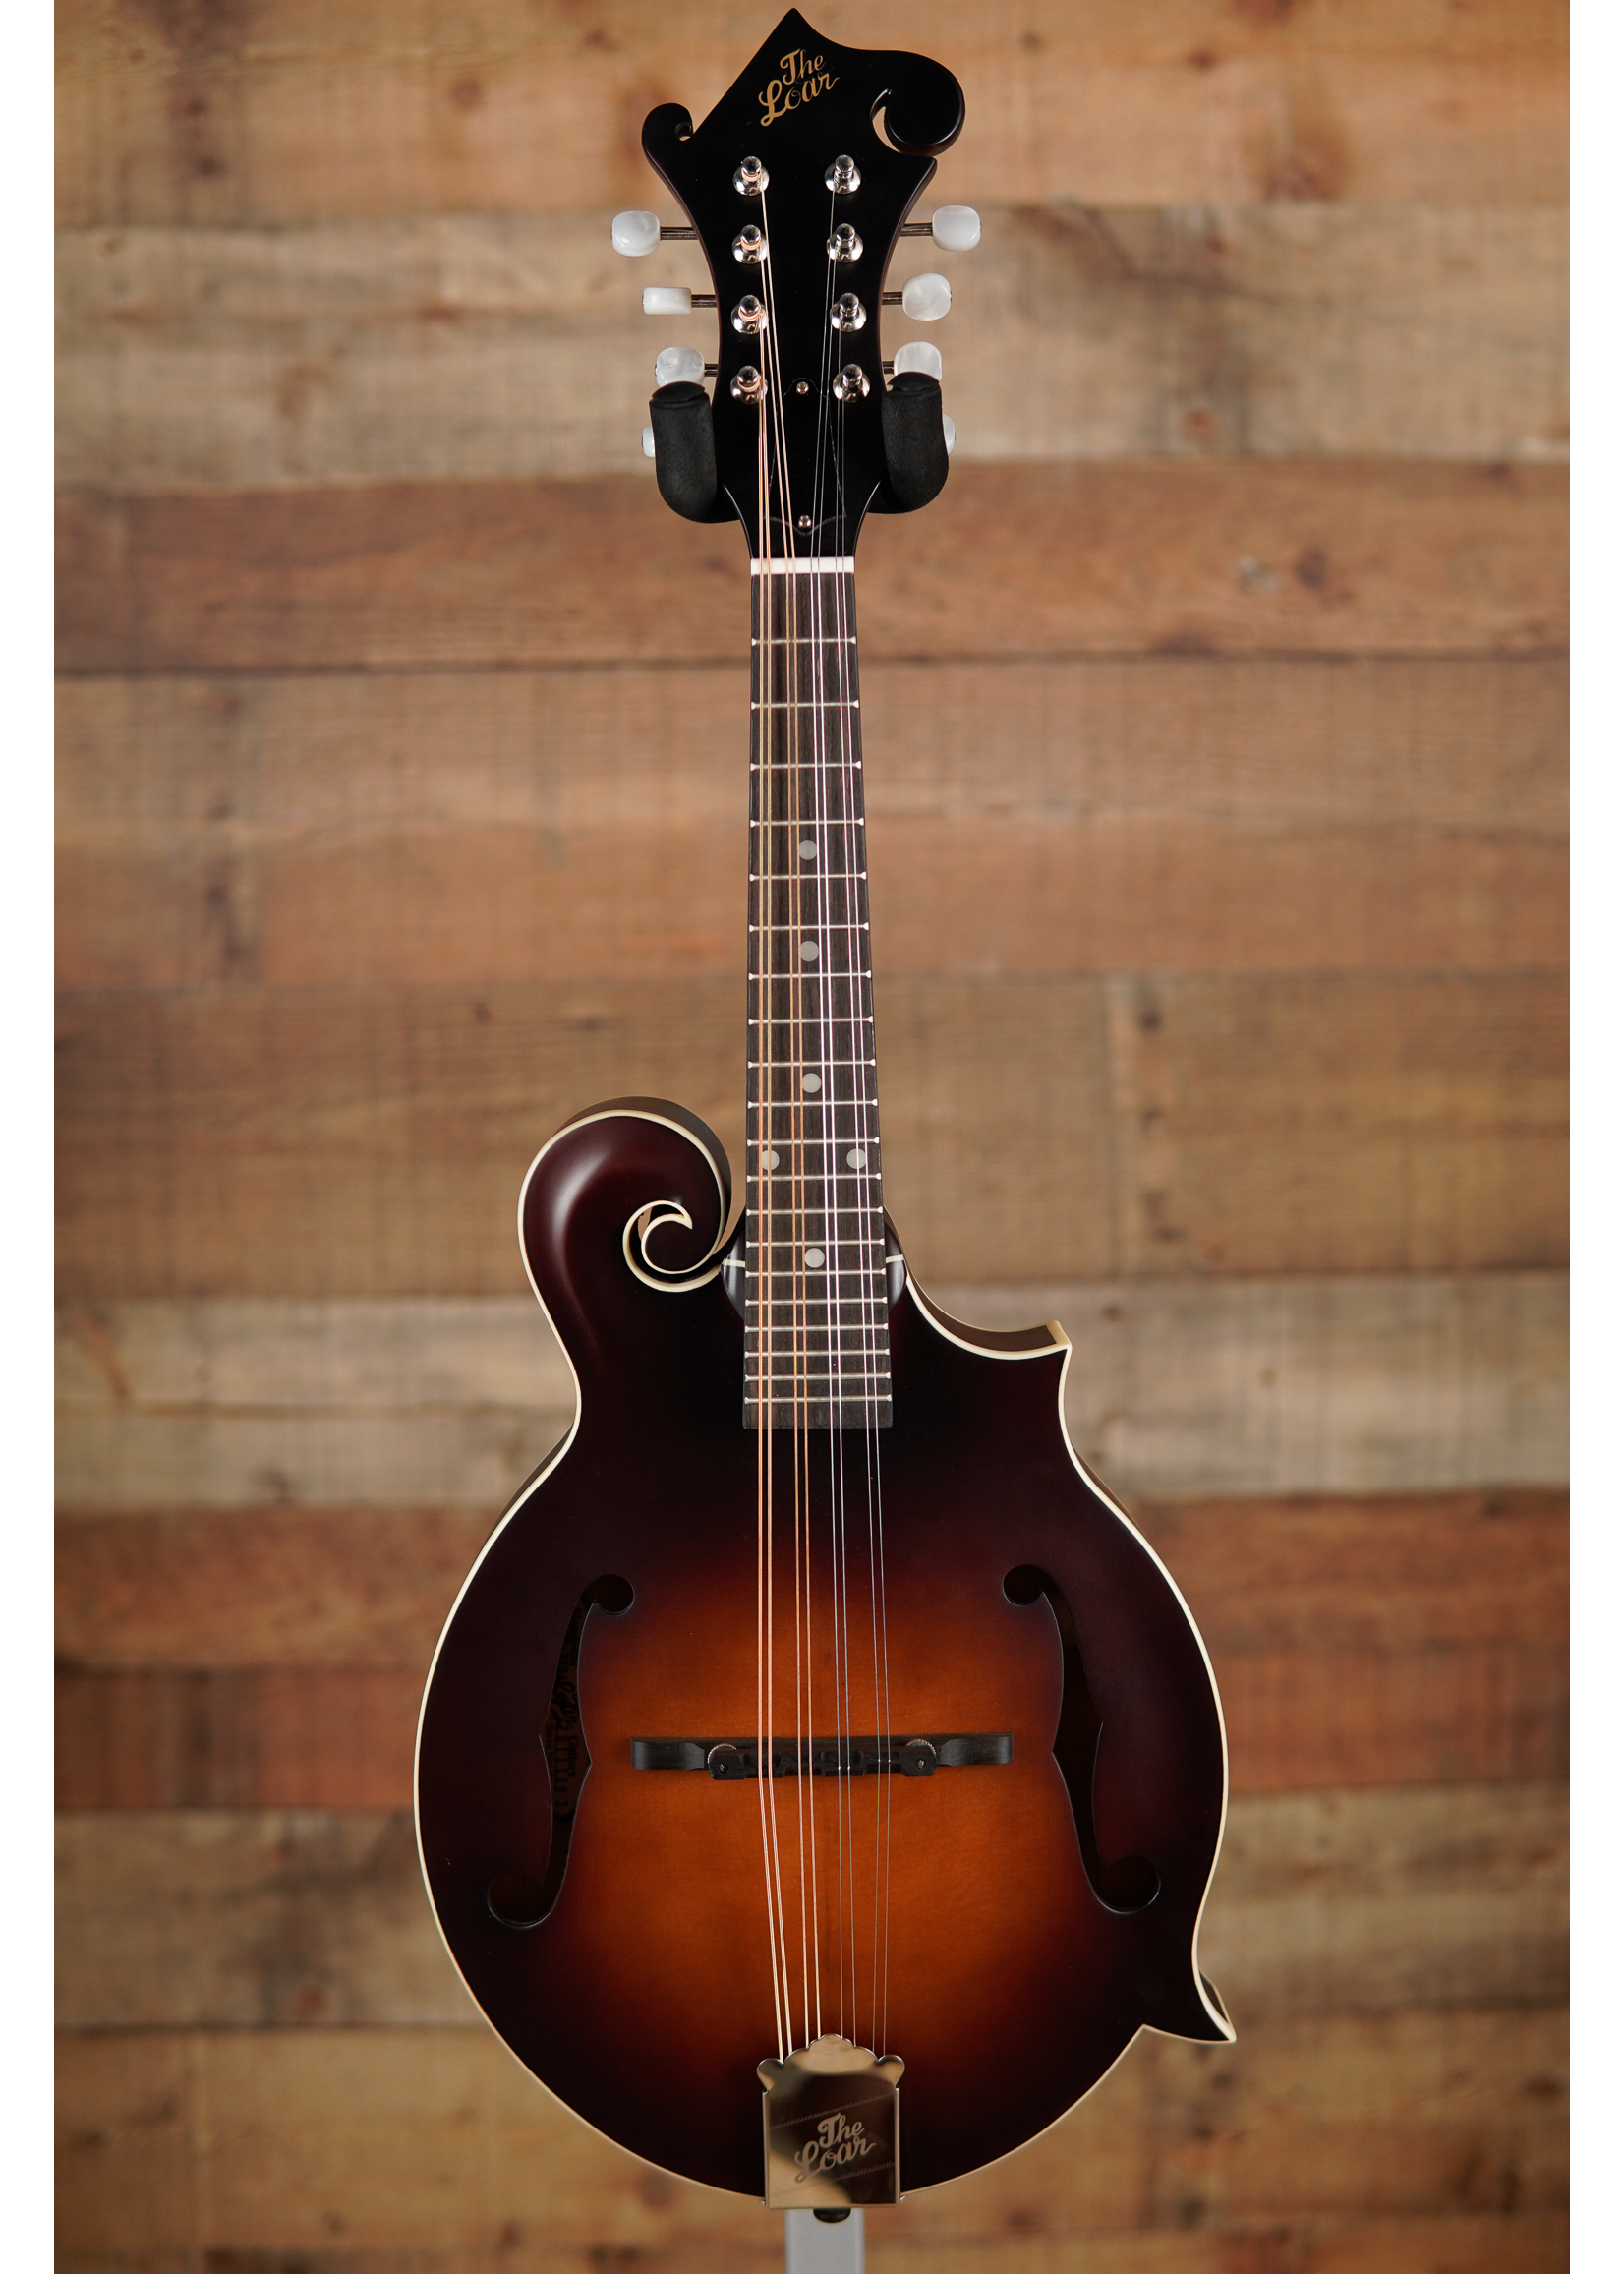 The Loar The Loar F Mandolin, Solid Top, Brownburst